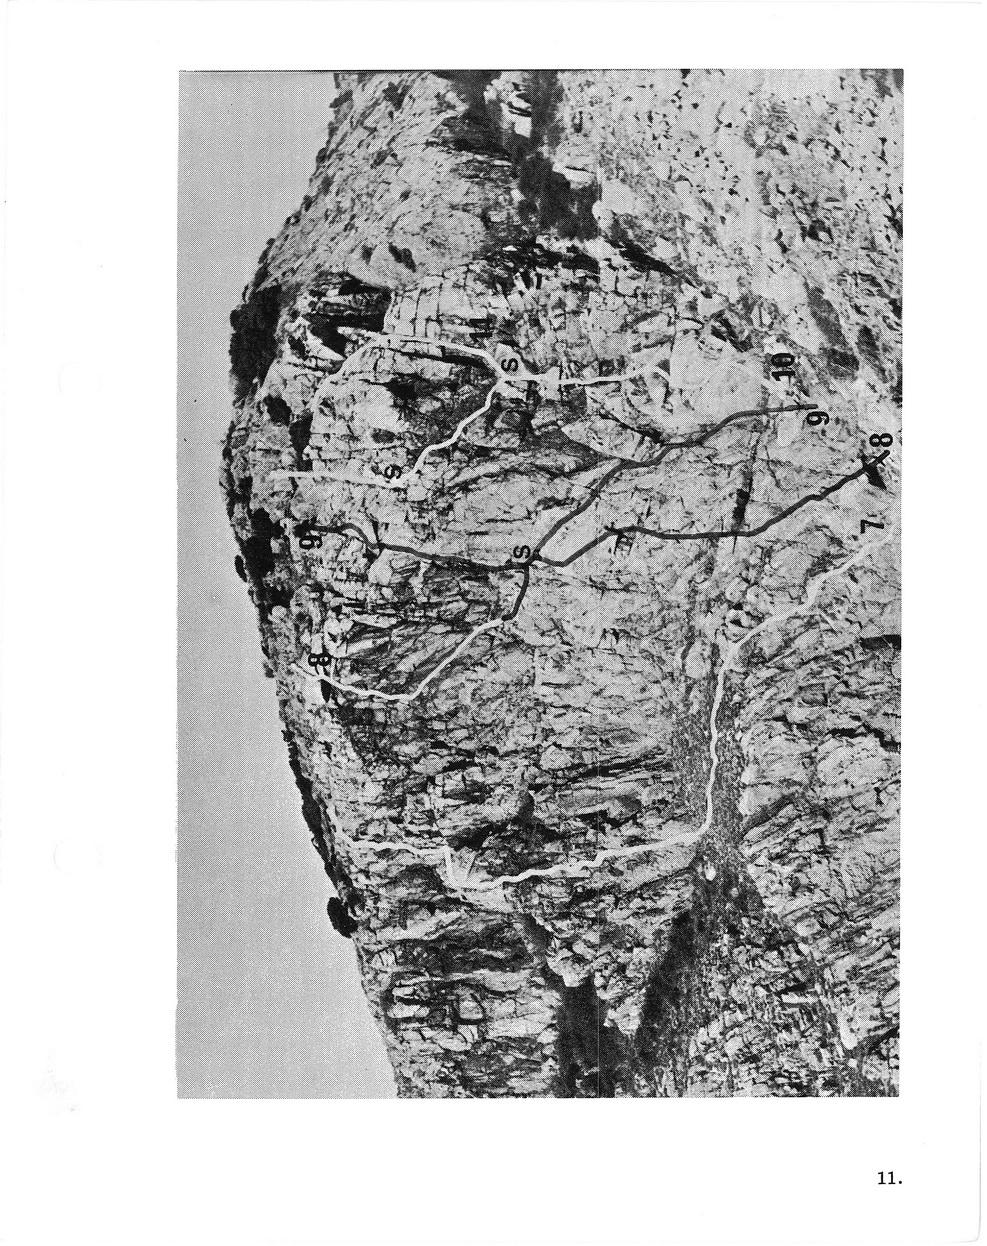 Kullen guide 1972 011.jpg